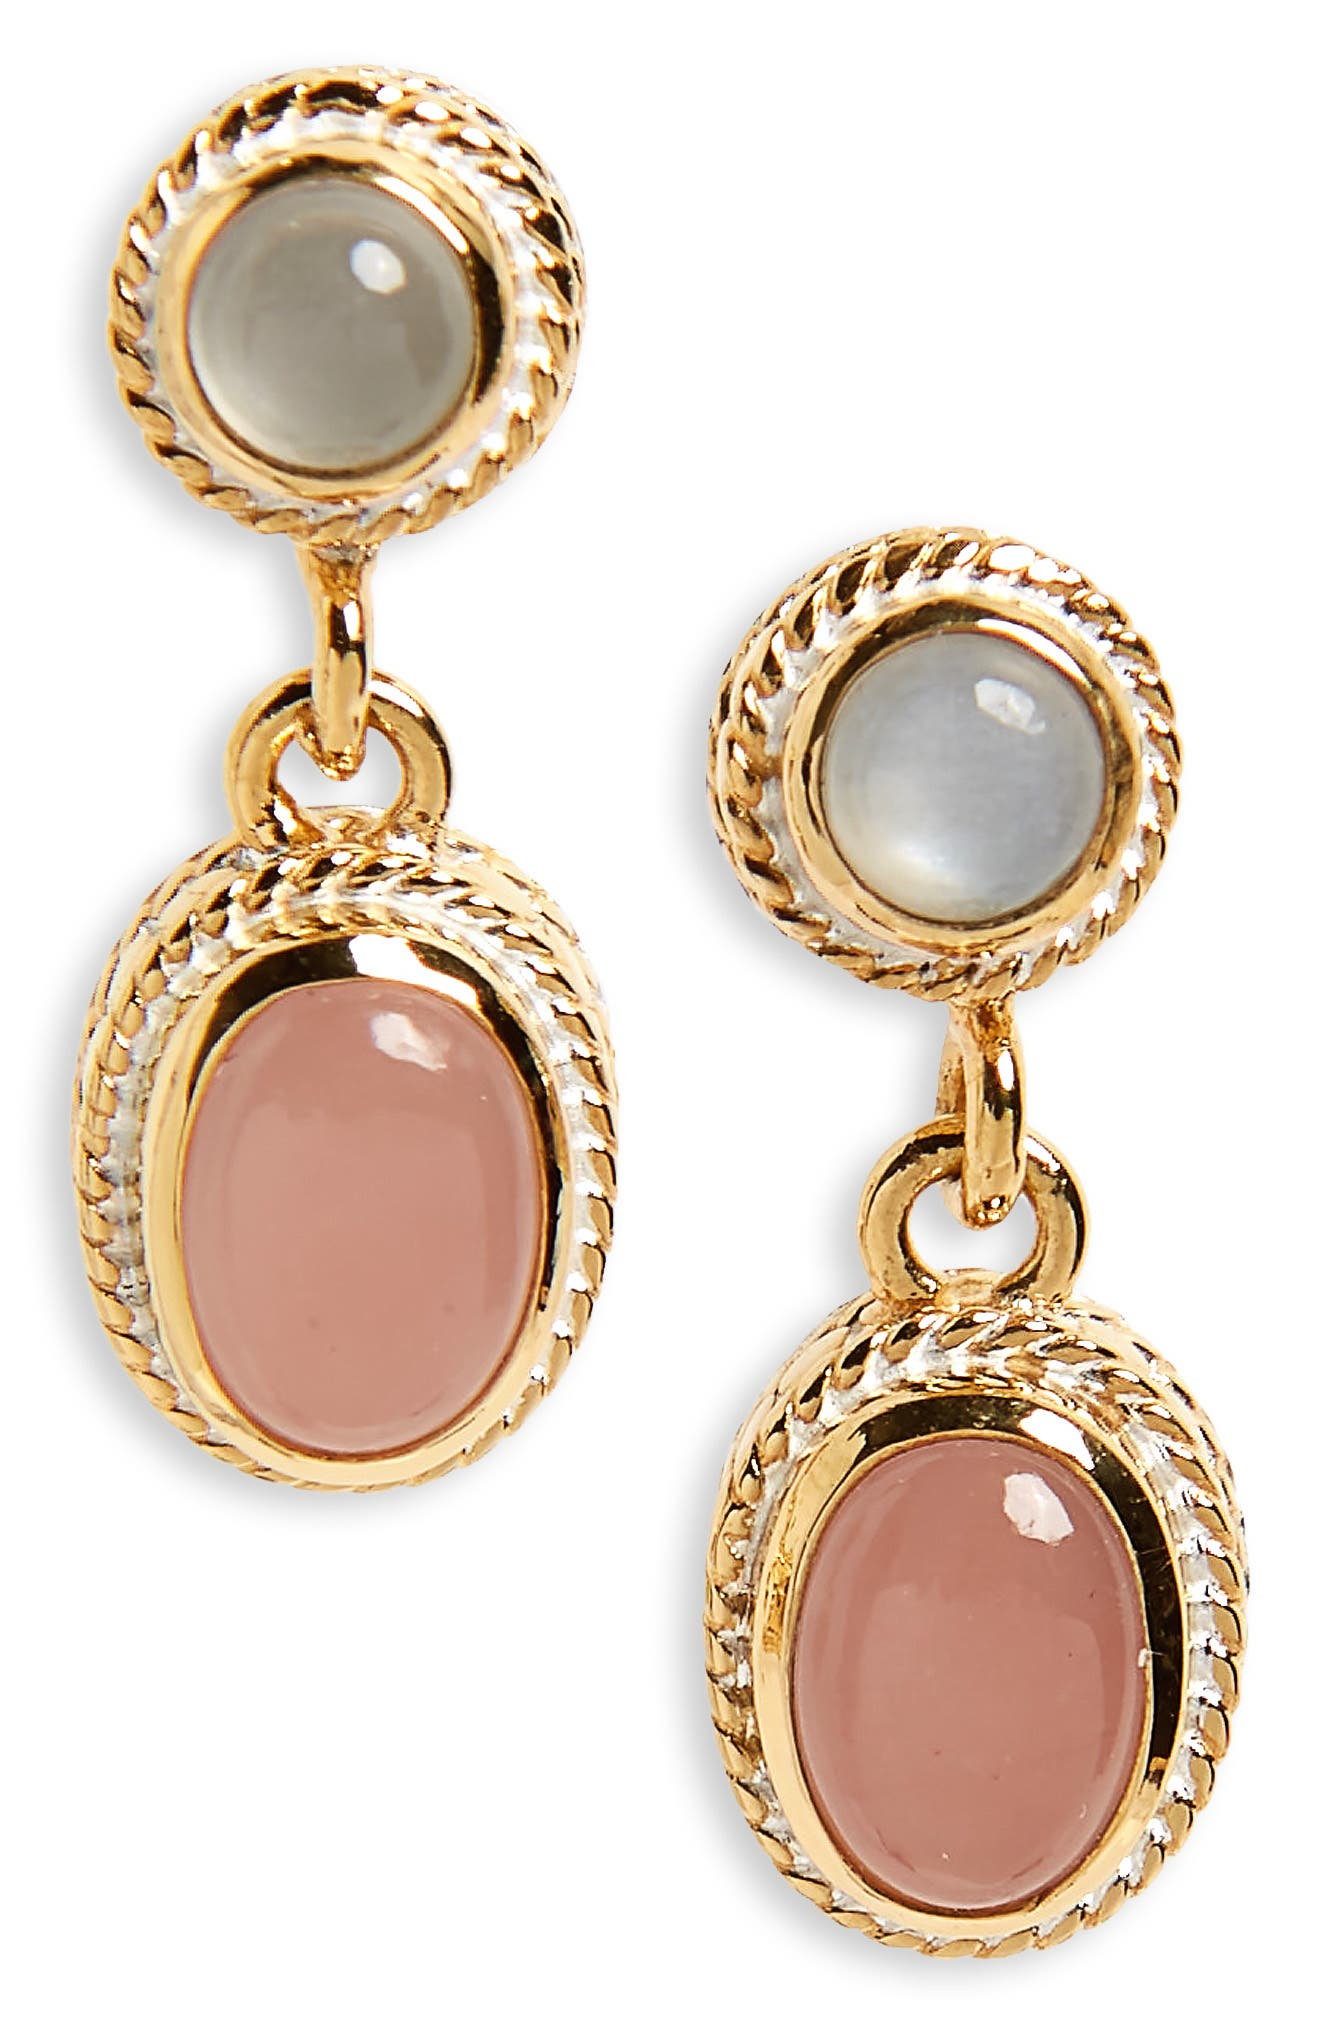 Double Drop Pearl Earrings,                             Main thumbnail 1, color,                             Gold/ Guava Quartz/ Moonstone